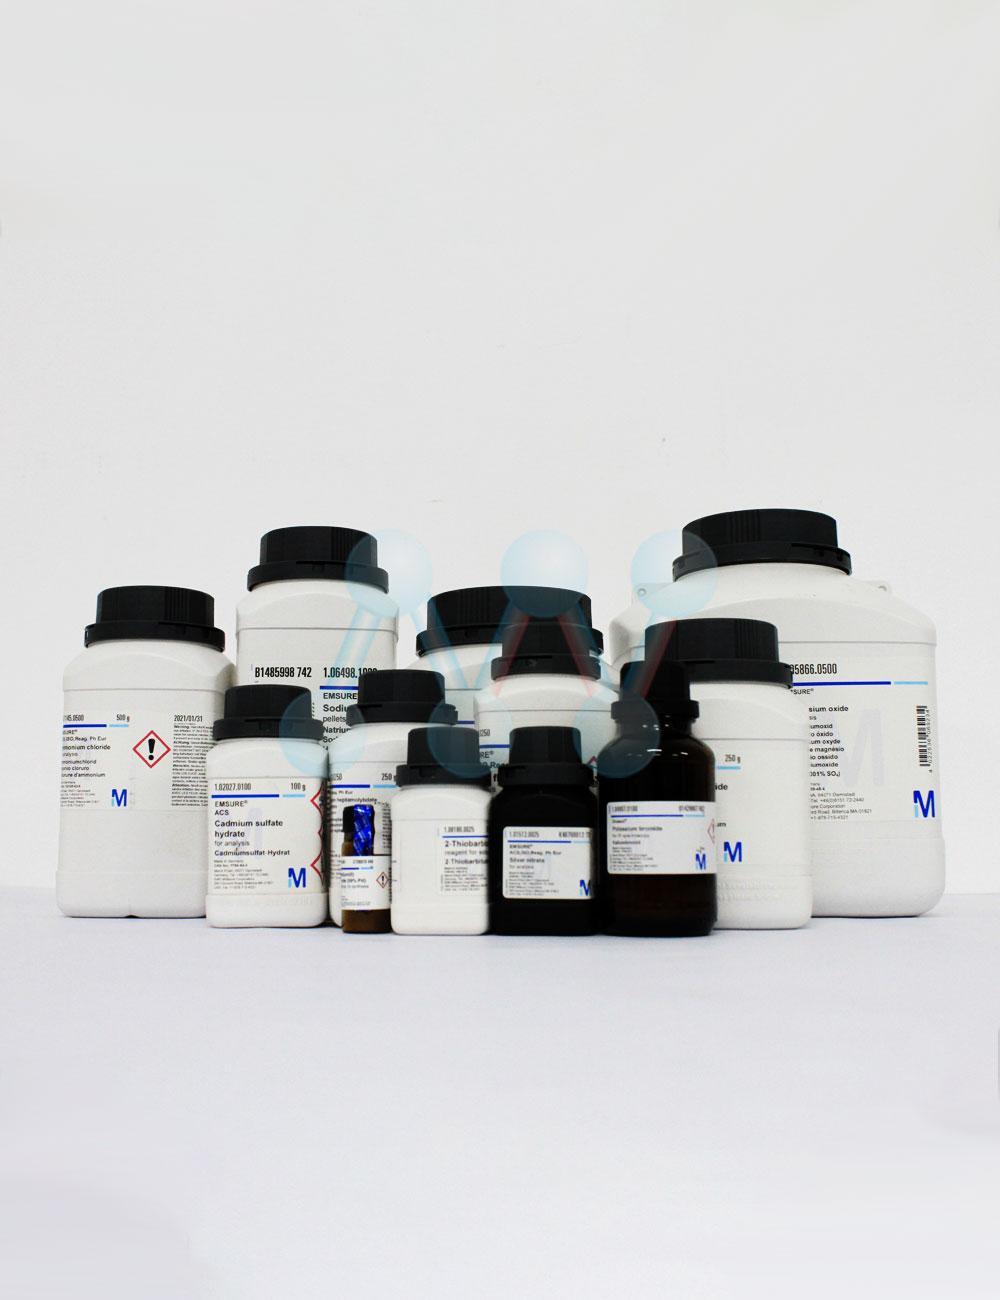 di-Potassium Hydrogen Phosphate K2HPO4